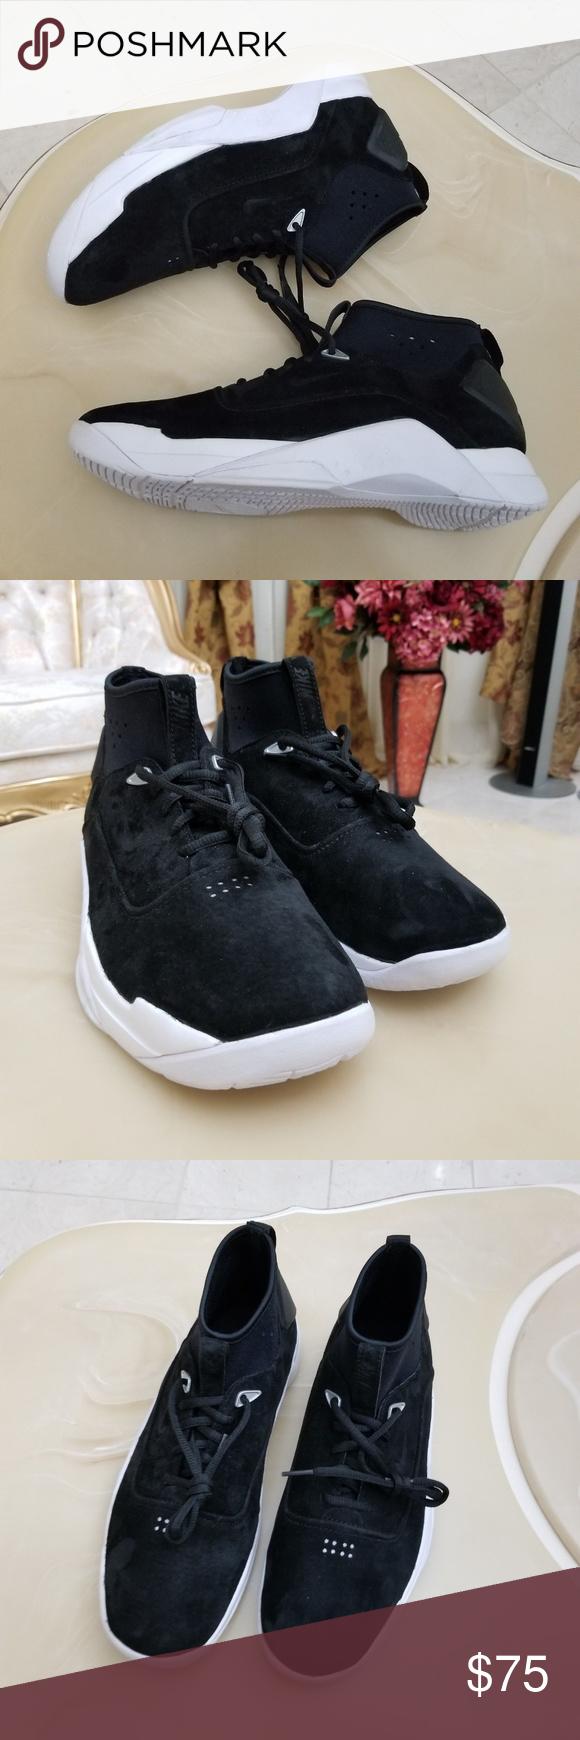 lacoste shoes hyperdunks low riomg